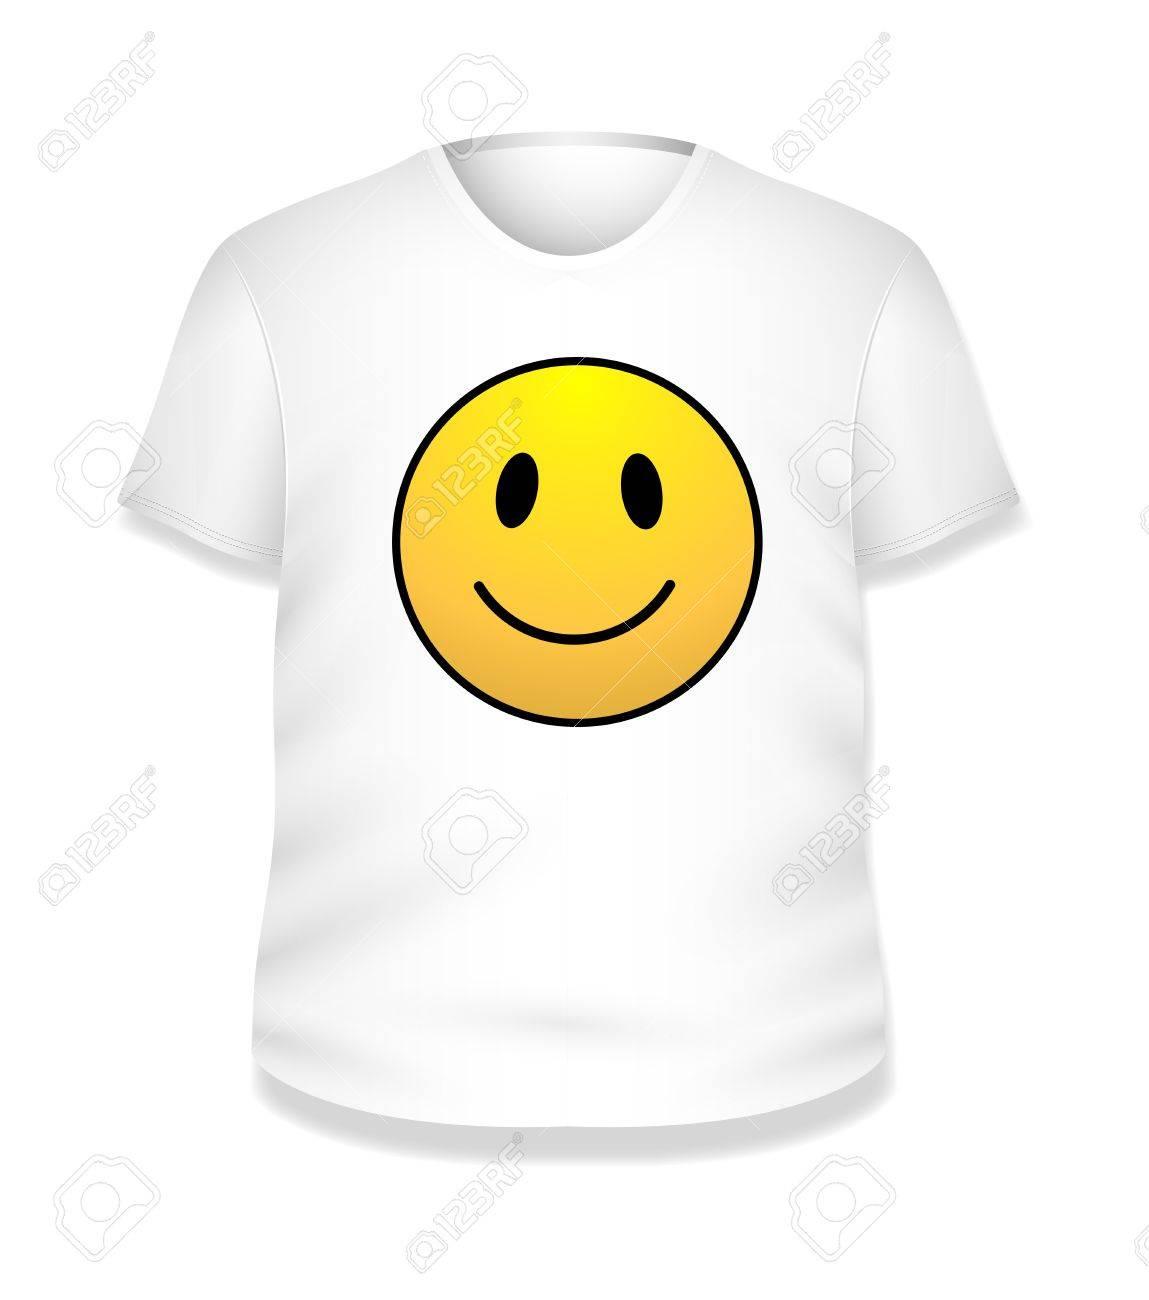 Shirt design illustrator template - Smiley Happy White T Shirt Design Illustration Template Stock Vector 19419800